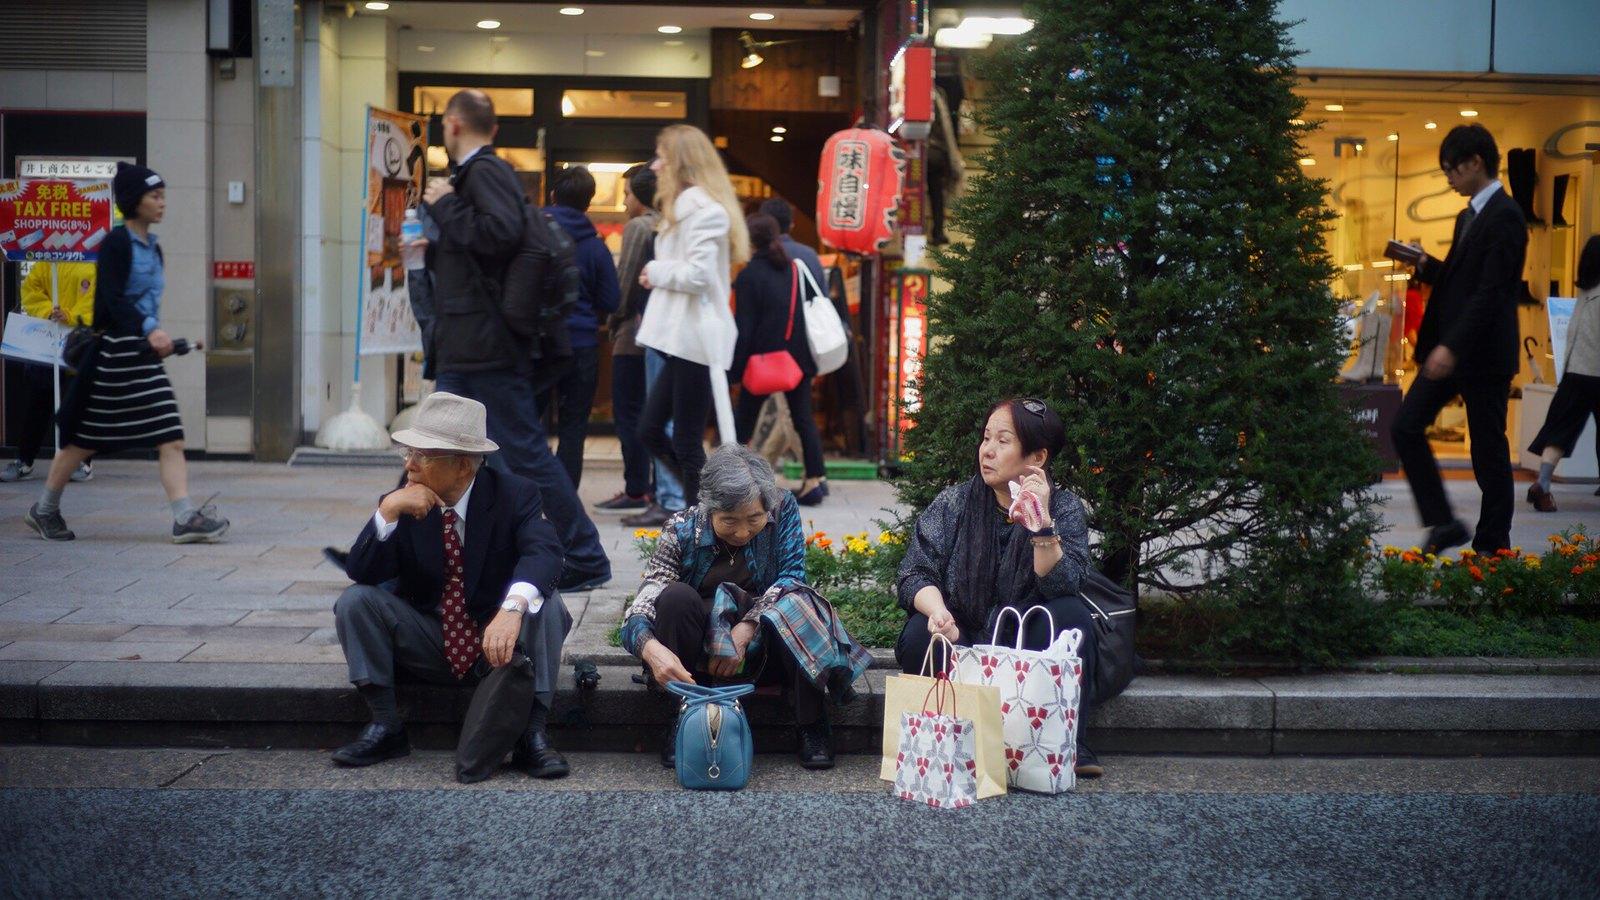 Shopping Break #SonyA7 #Voigtlander40mm #Ginza #Tokyo #foto